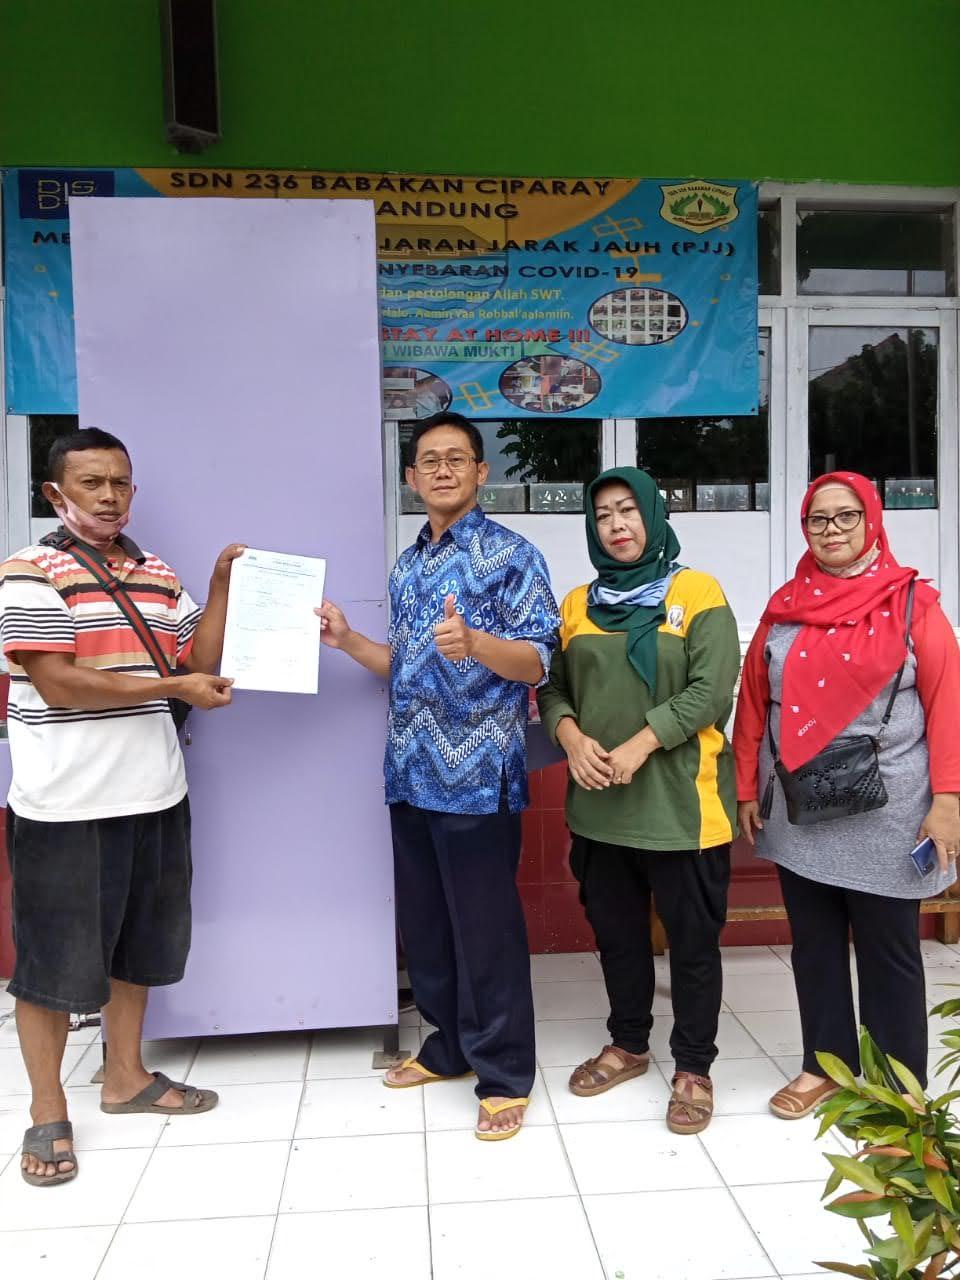 Foto Kegiatan Serah Terima Wastafel dari Dinas Pendidikan Kota Bandung kepada SDN 236 Babakan Ciparay